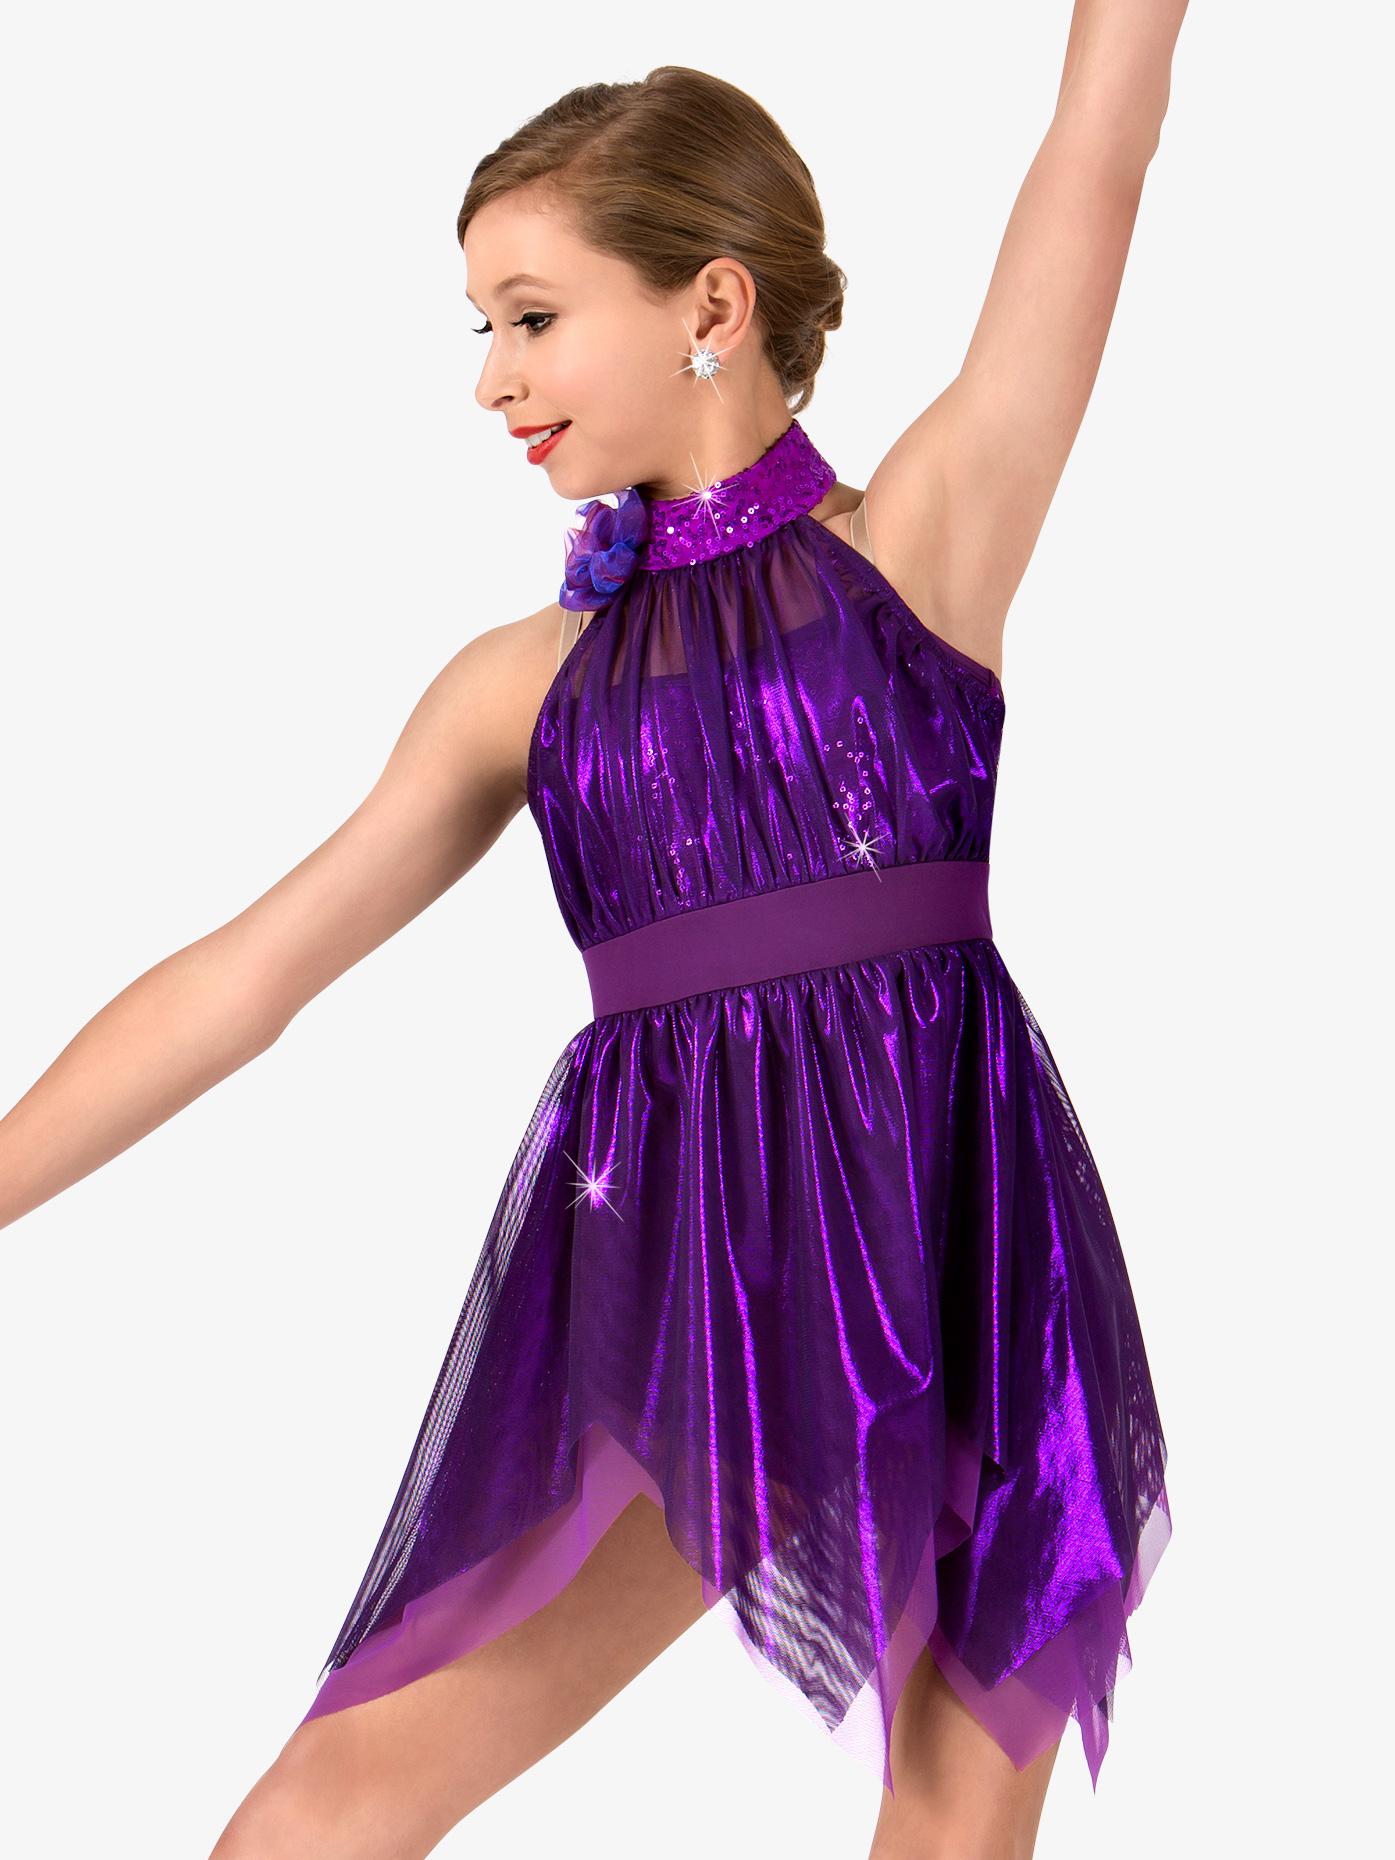 Elisse by Double Platinum Girls Metallic High Neck Handkerchief Performance Dress N7465C